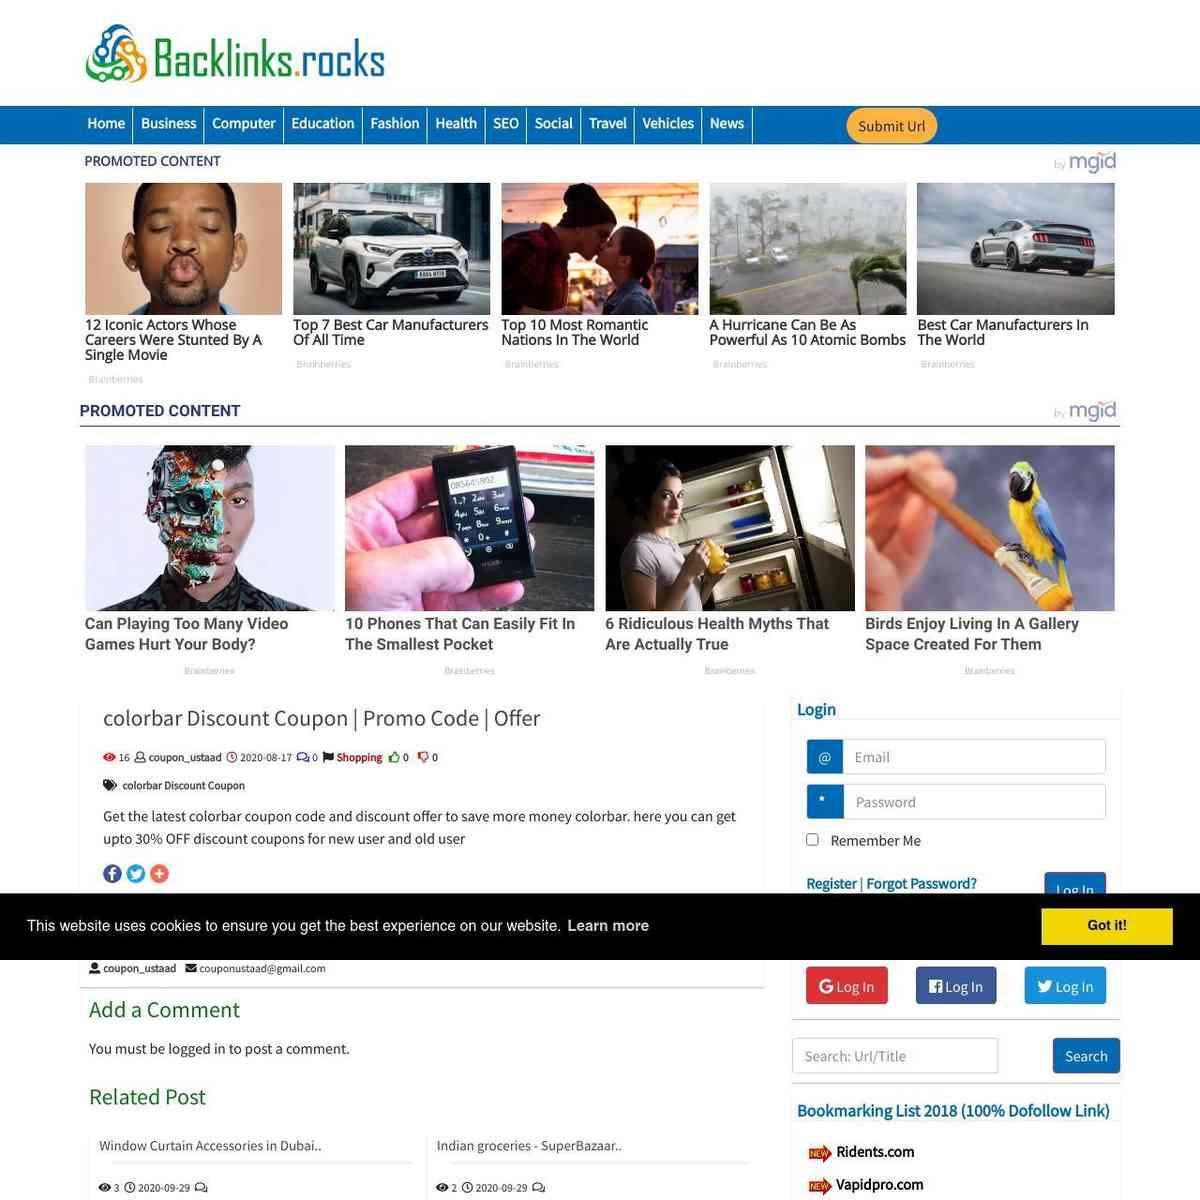 backlink.rocks/post/3074/colorbar-Discount-Coupon-Promo-Code-Offer